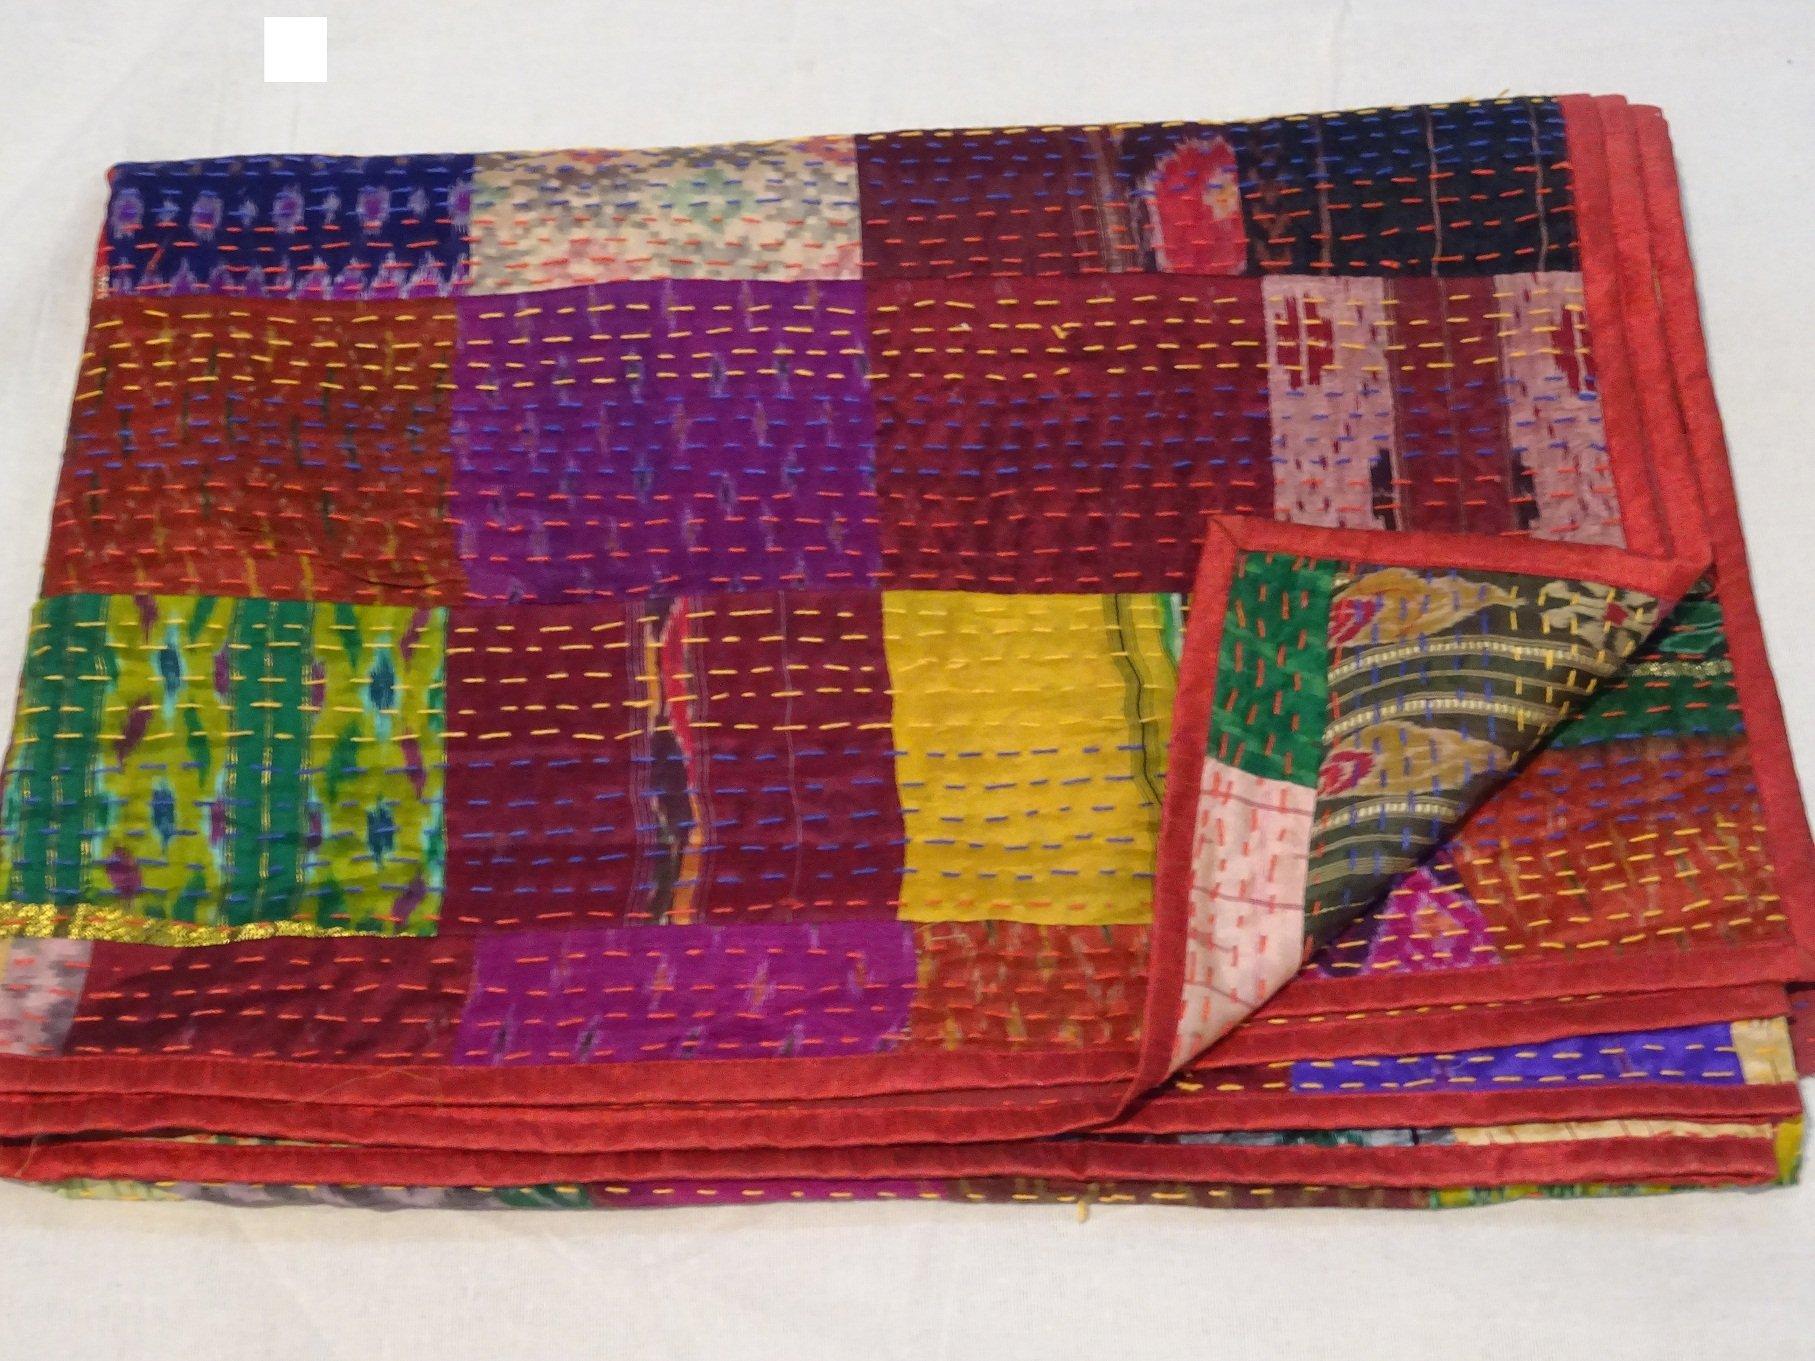 Tribal Asian Textiles Indian Quilt -Twin Vintage Quilt Old Patola Indian Silk Sari Kantha Quilted Patchwork Bedspread Bohemian Kantha Throws, Gudari Handmade